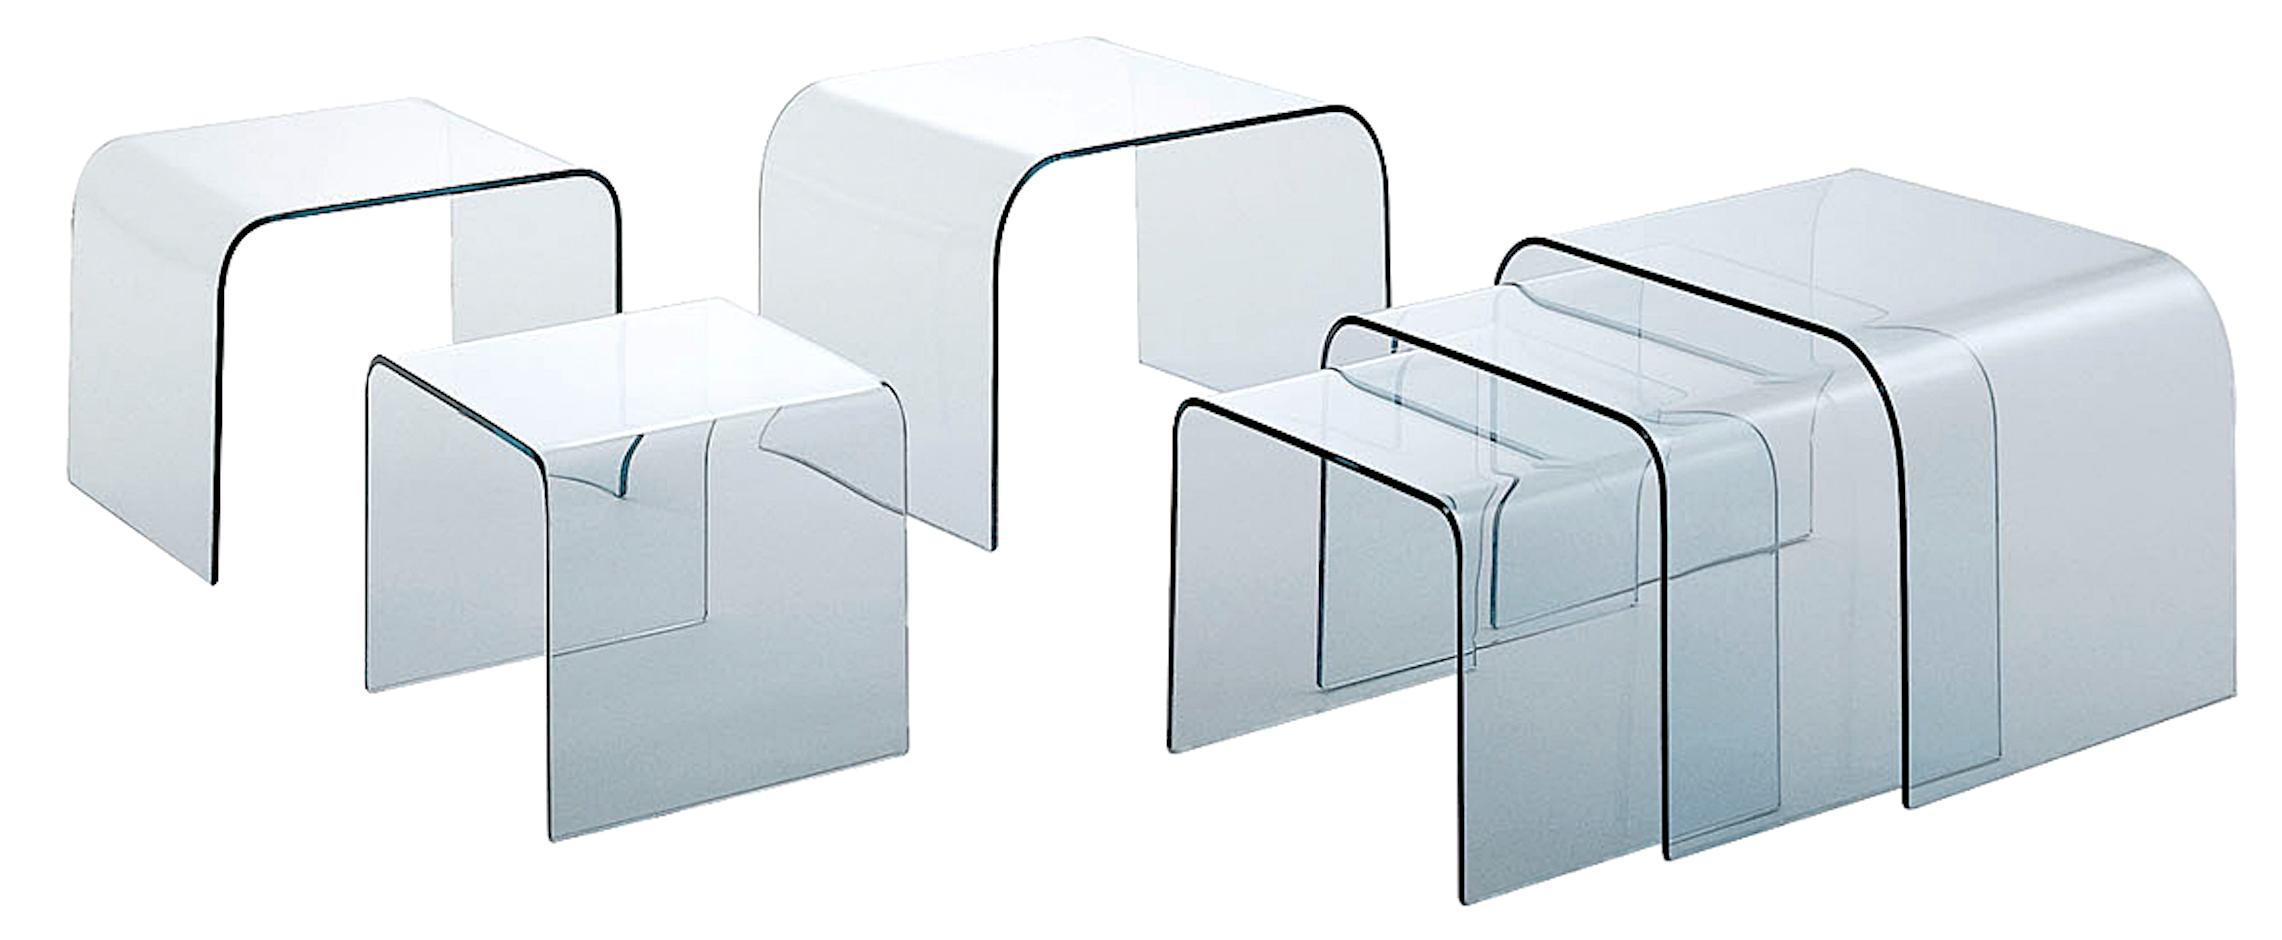 Product Image Nurglas Side Table/Coffee Table